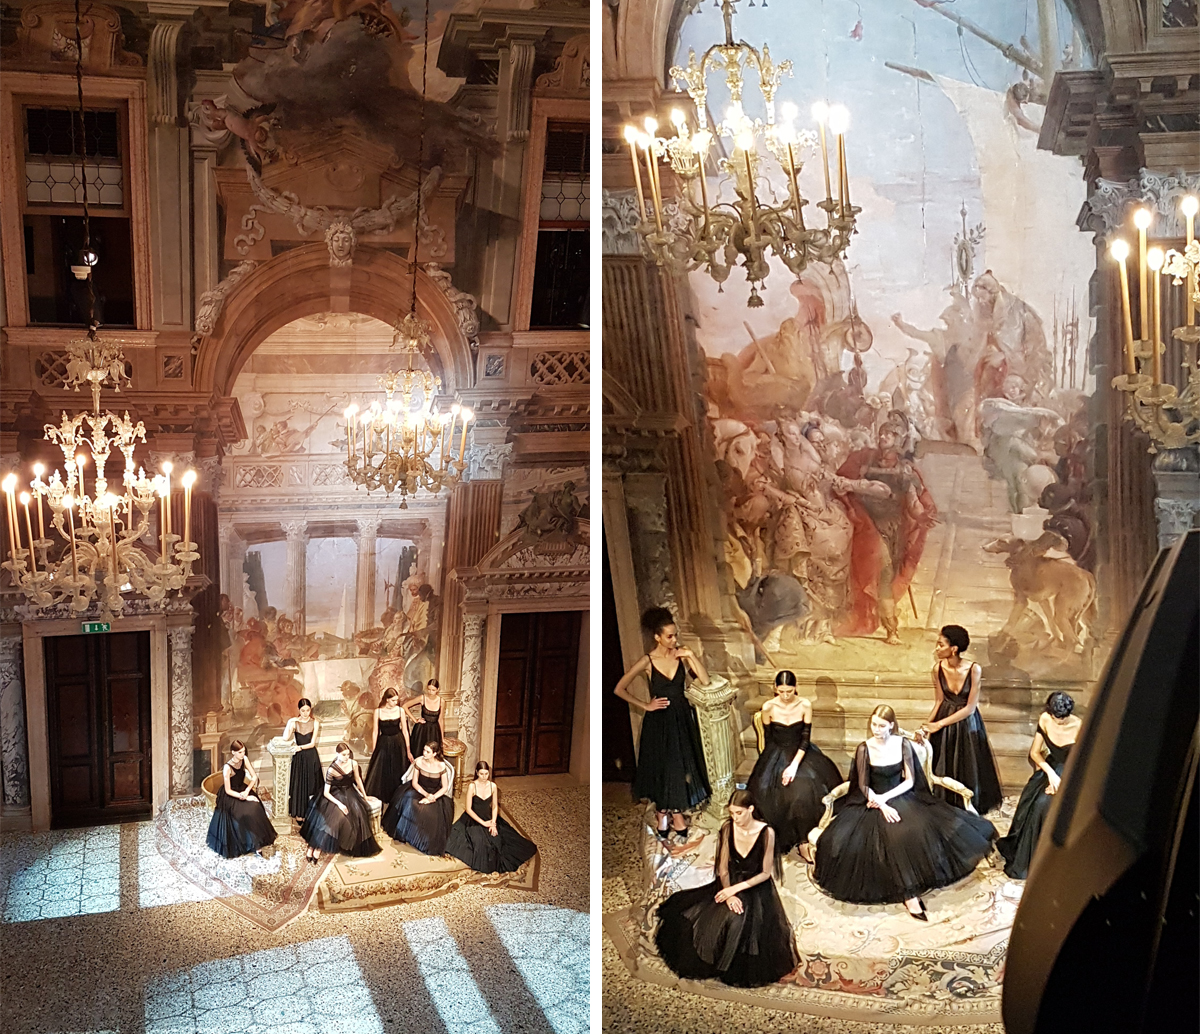 RL, CSP, CSE Piano Gestione Emergenze  Emergency Response Plan – Christian Dior fashion show, Nexa, Palazzo Labia,Venice 2019